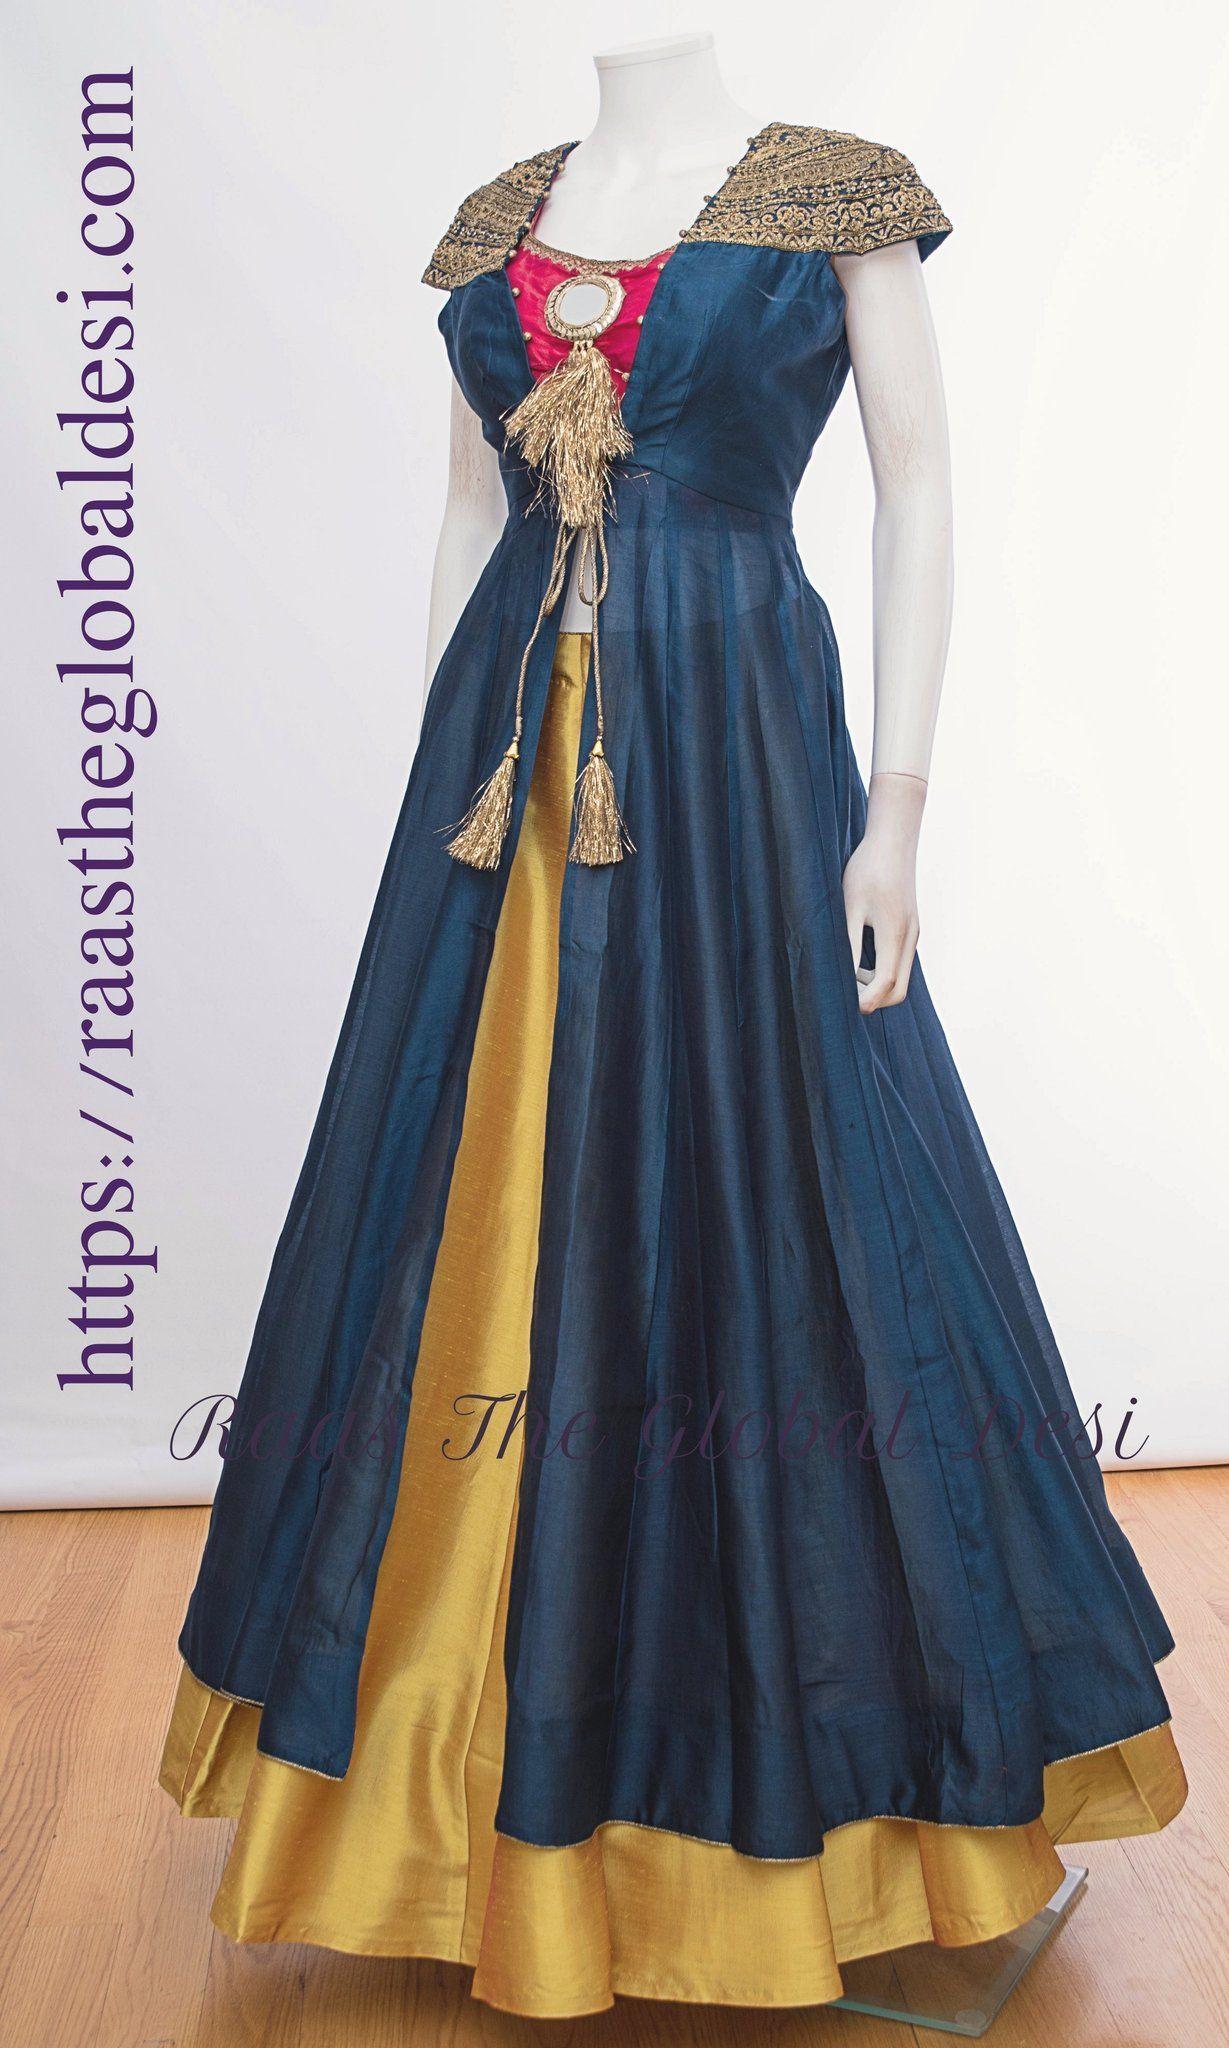 Ag1380 kruti in 2020 indian gowns dresses wedding dress